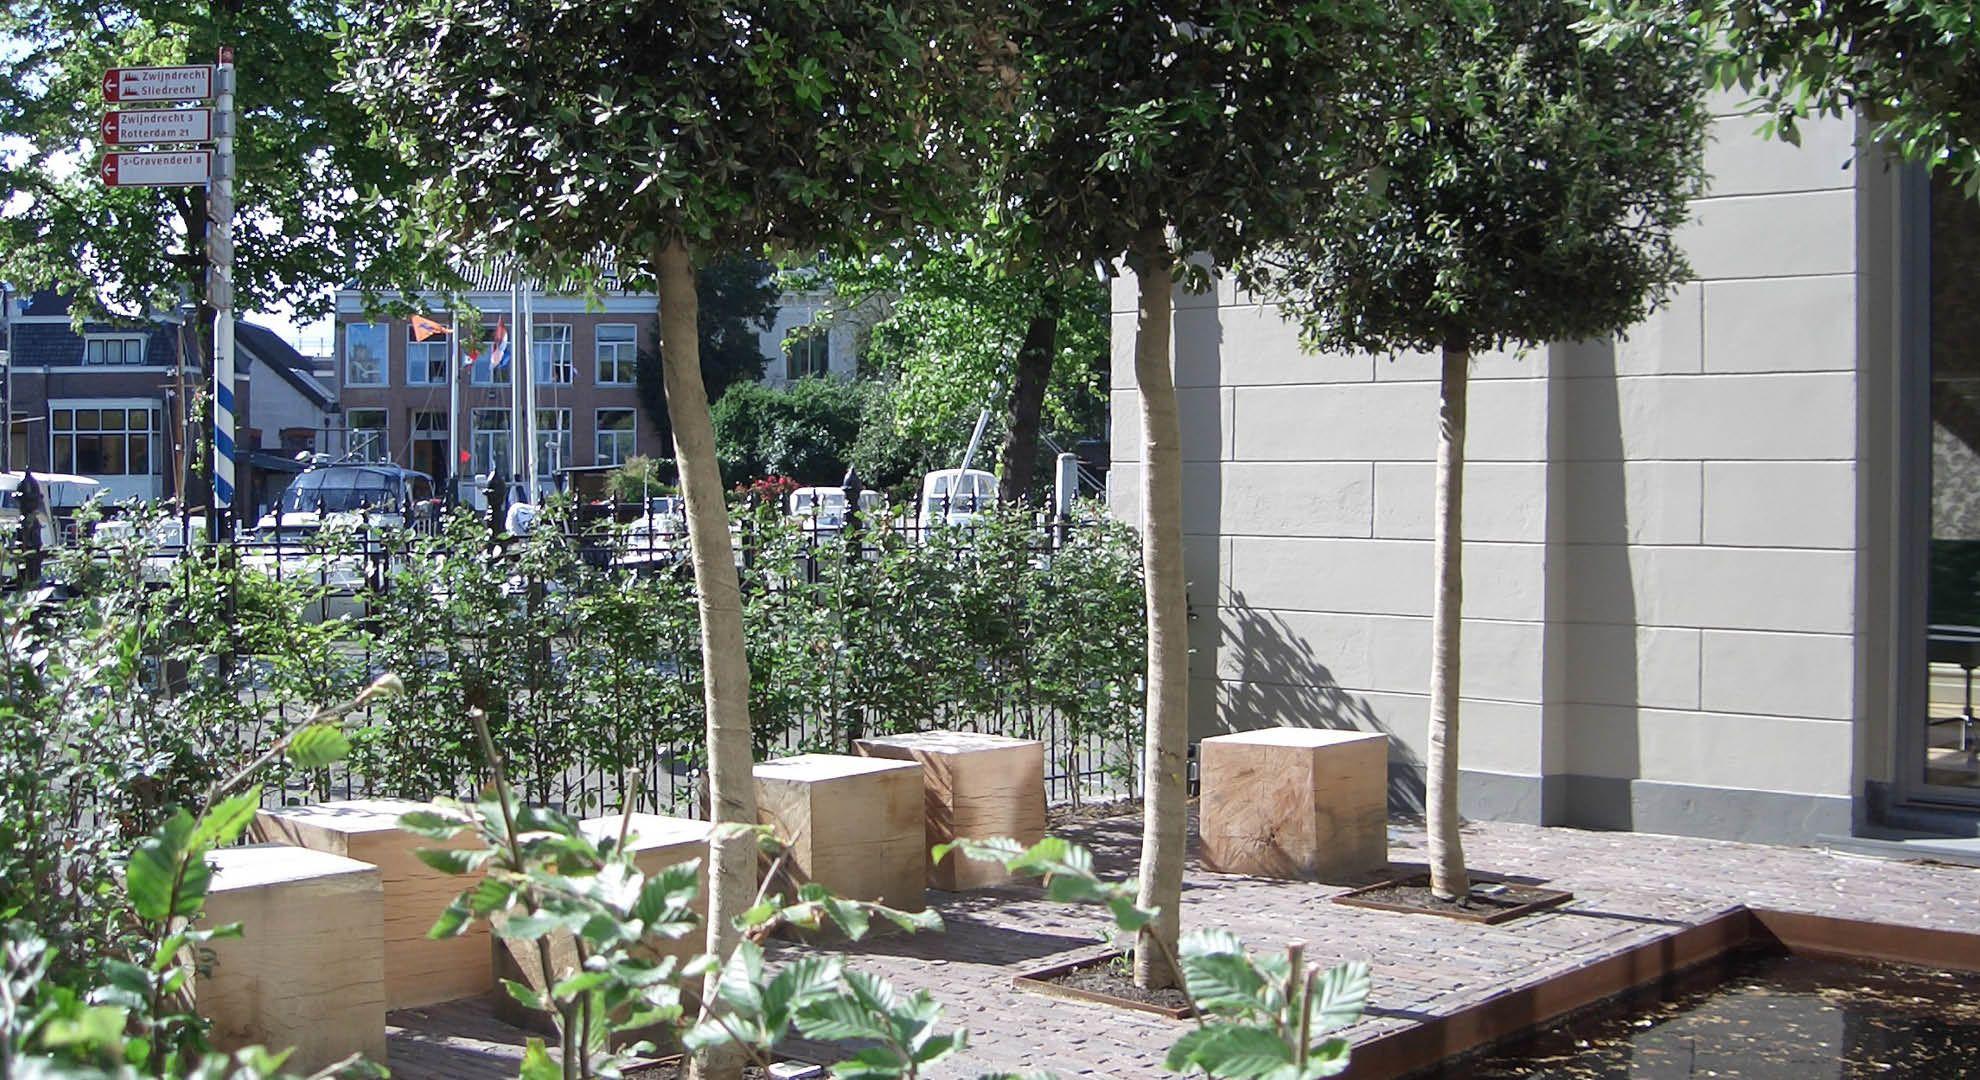 Rodenburg tuinen kantoortuin in dordrecht spiegelvijver met